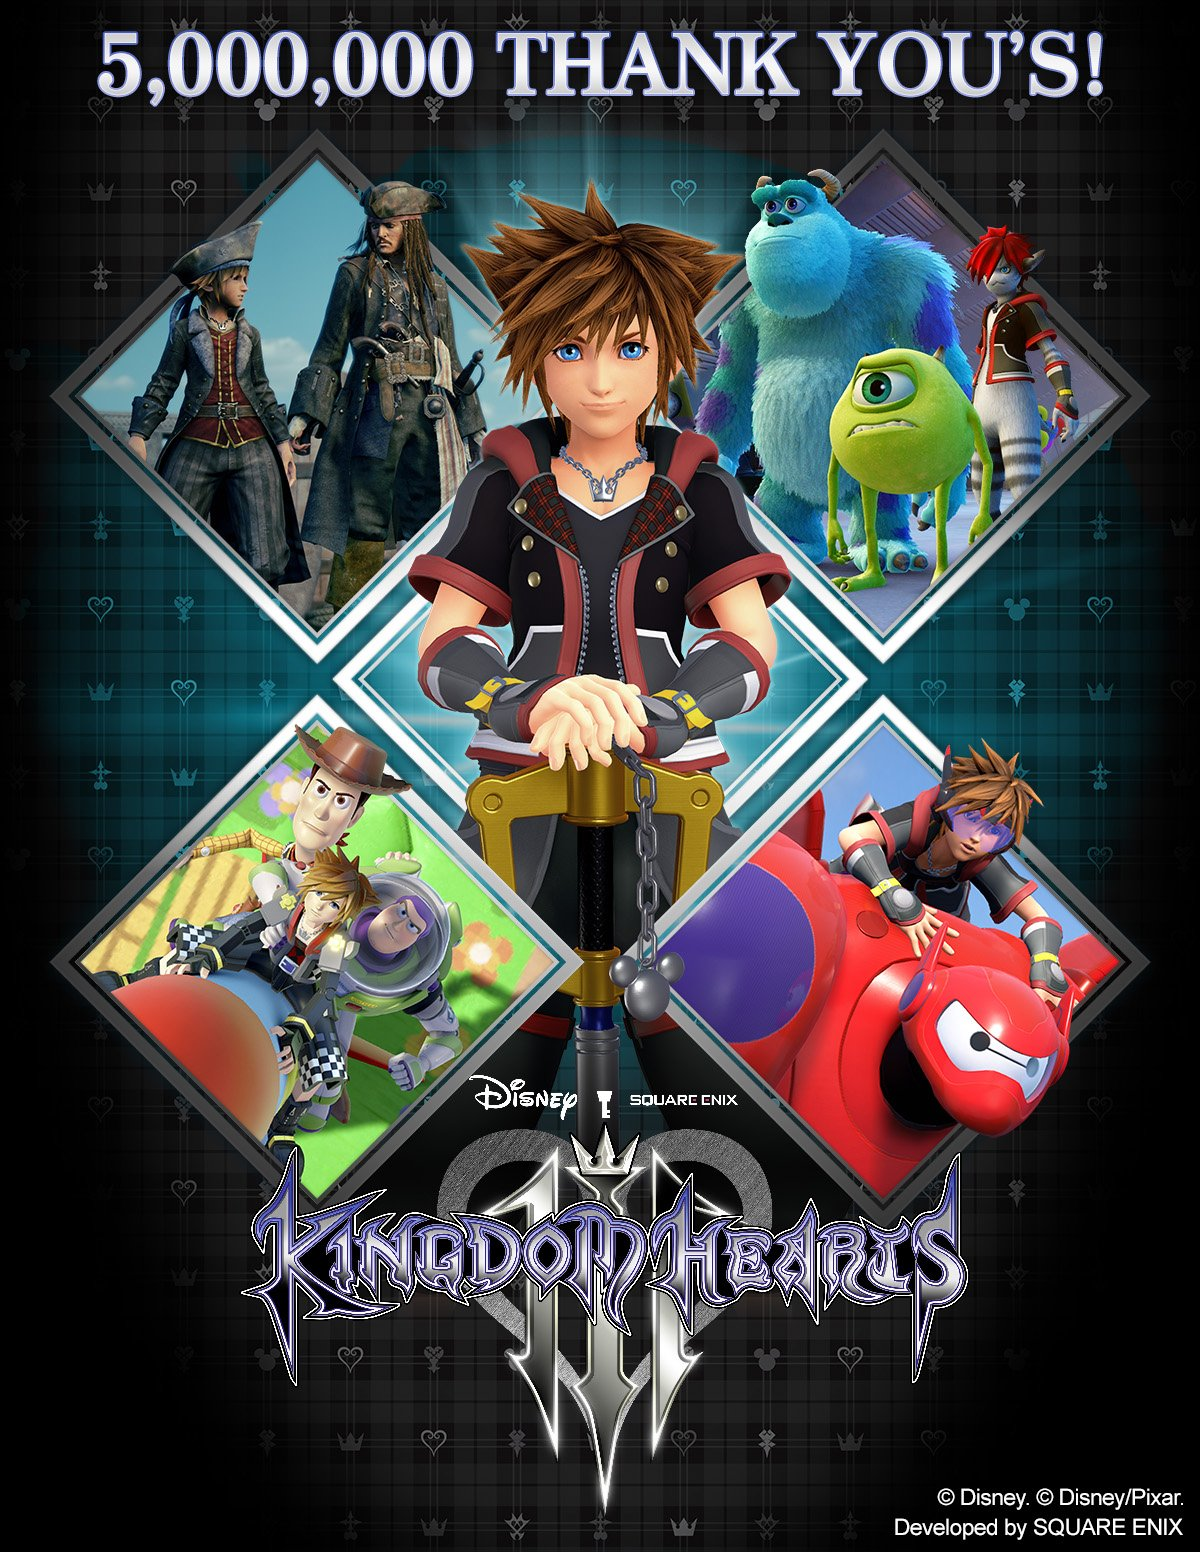 Kingdom Hearts III ships 5 million units worldwide